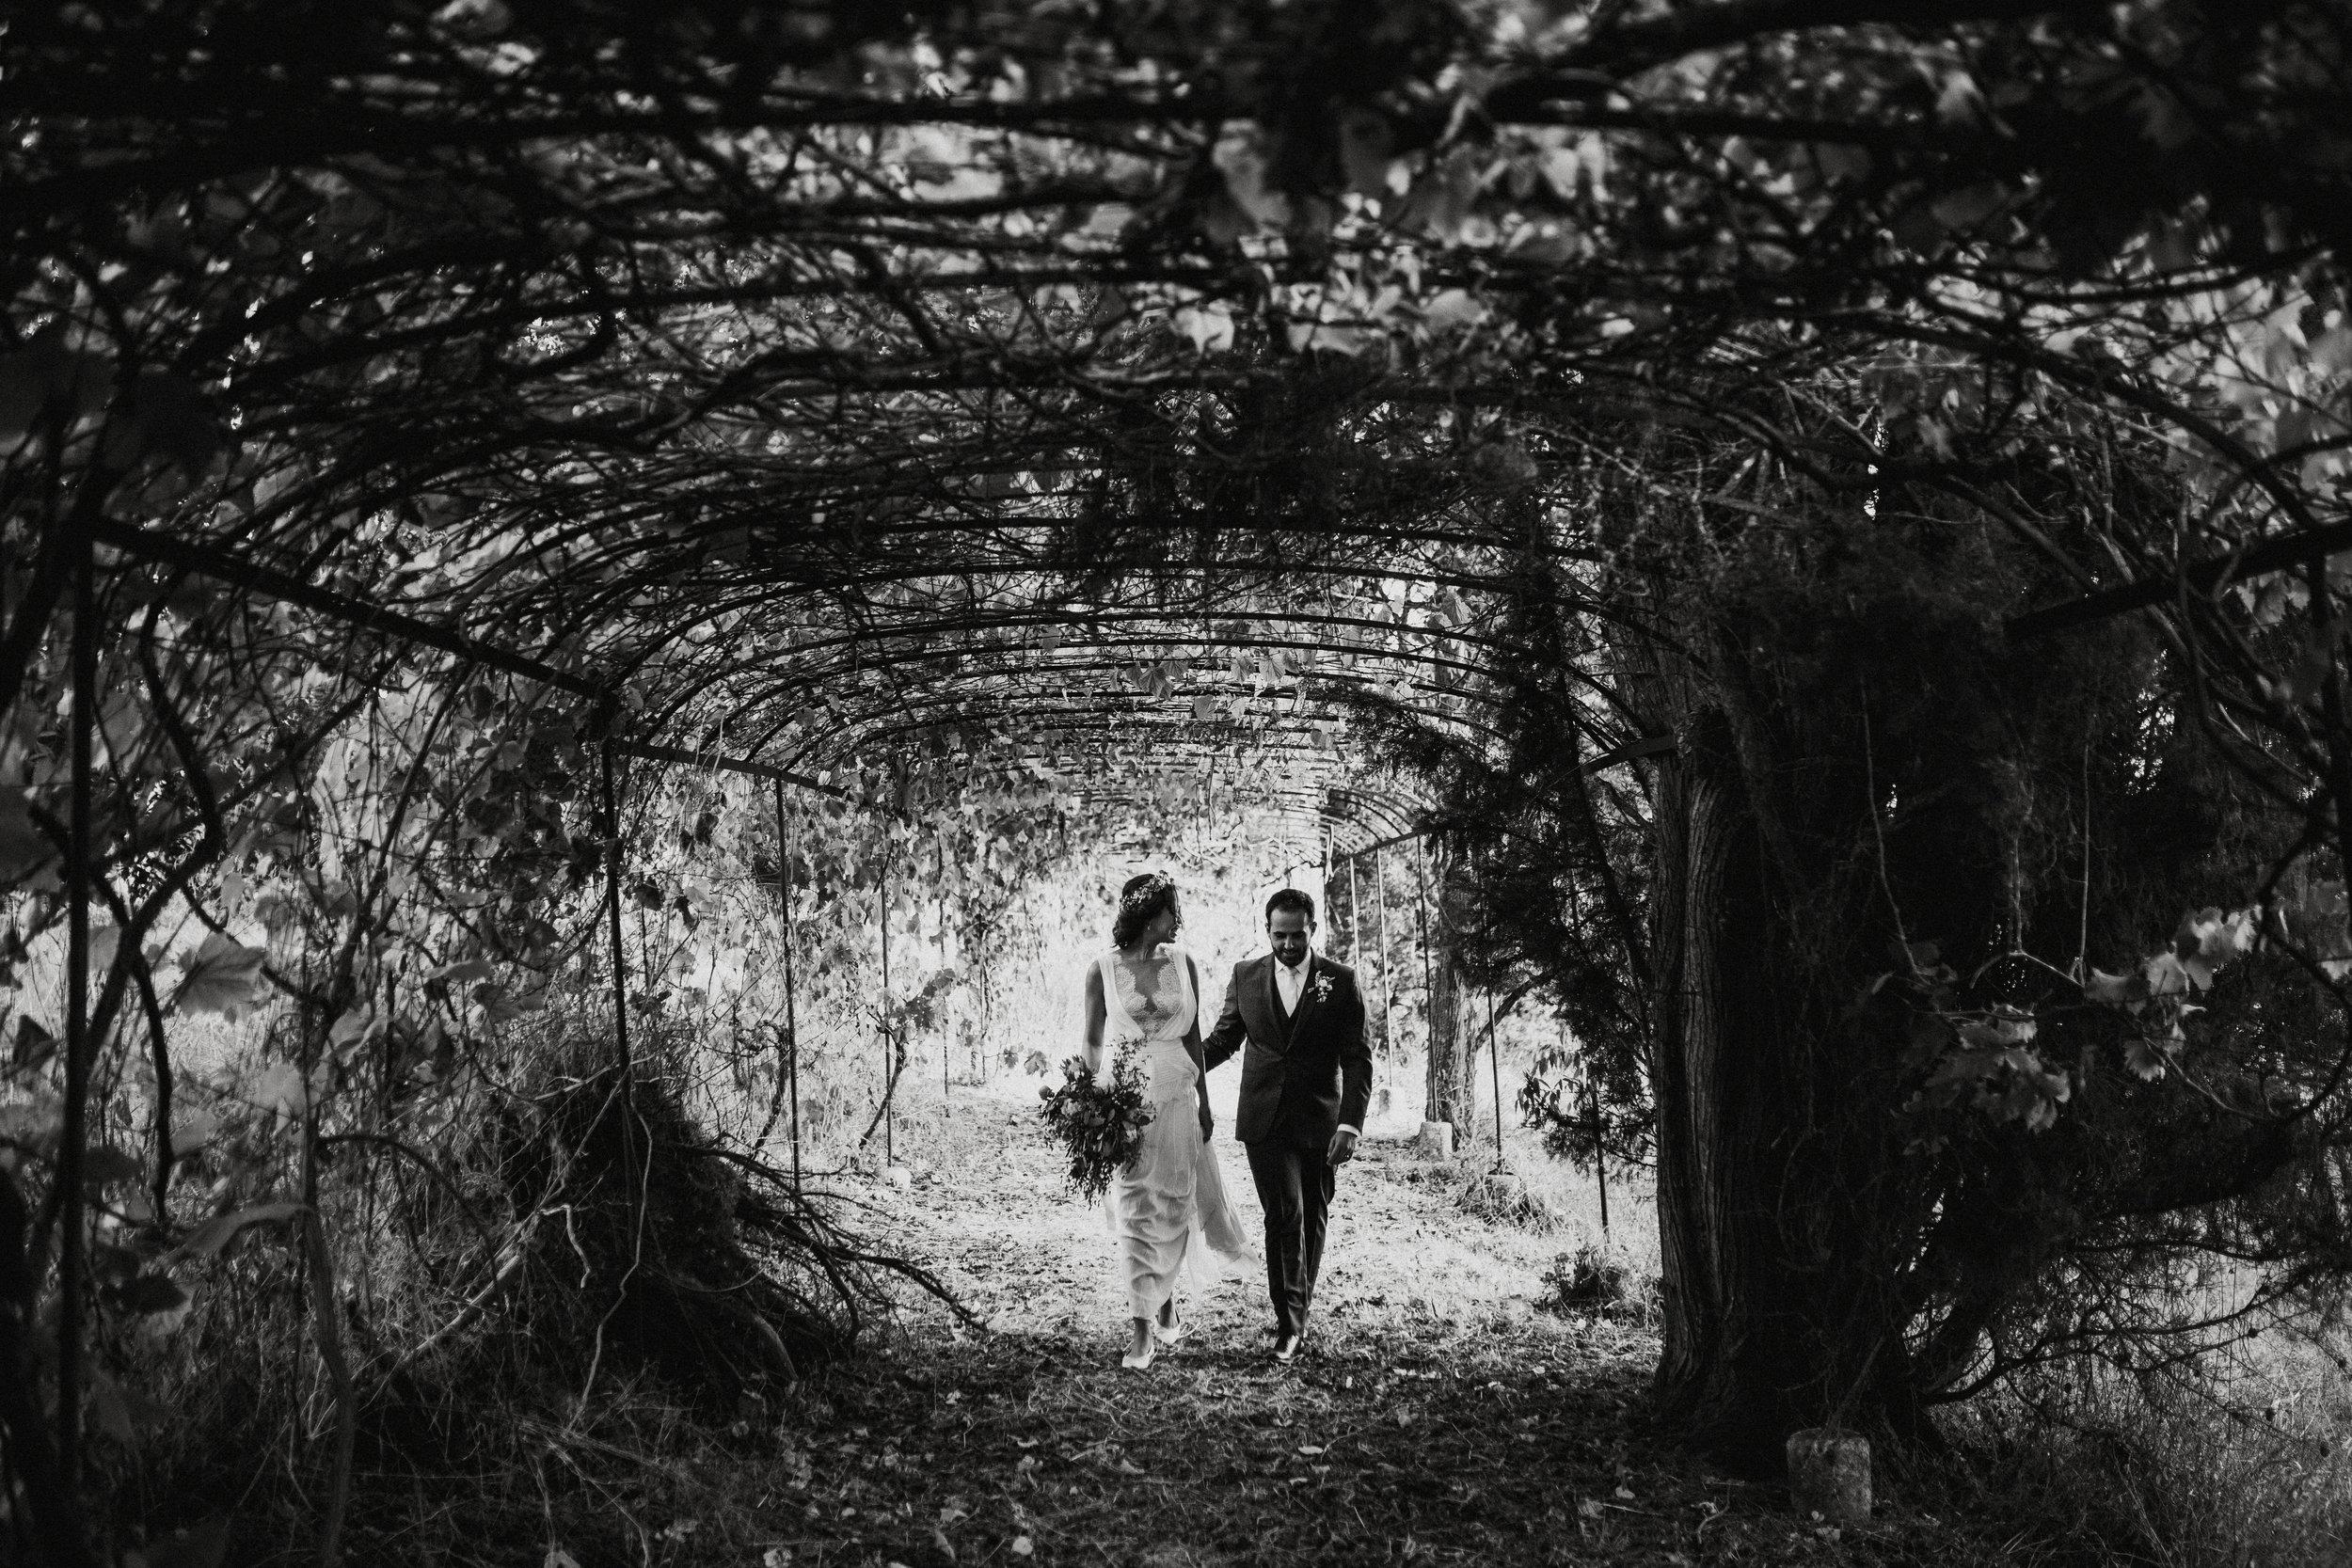 R&J482_ 09 setembro 2017 Wedding day_.jpg